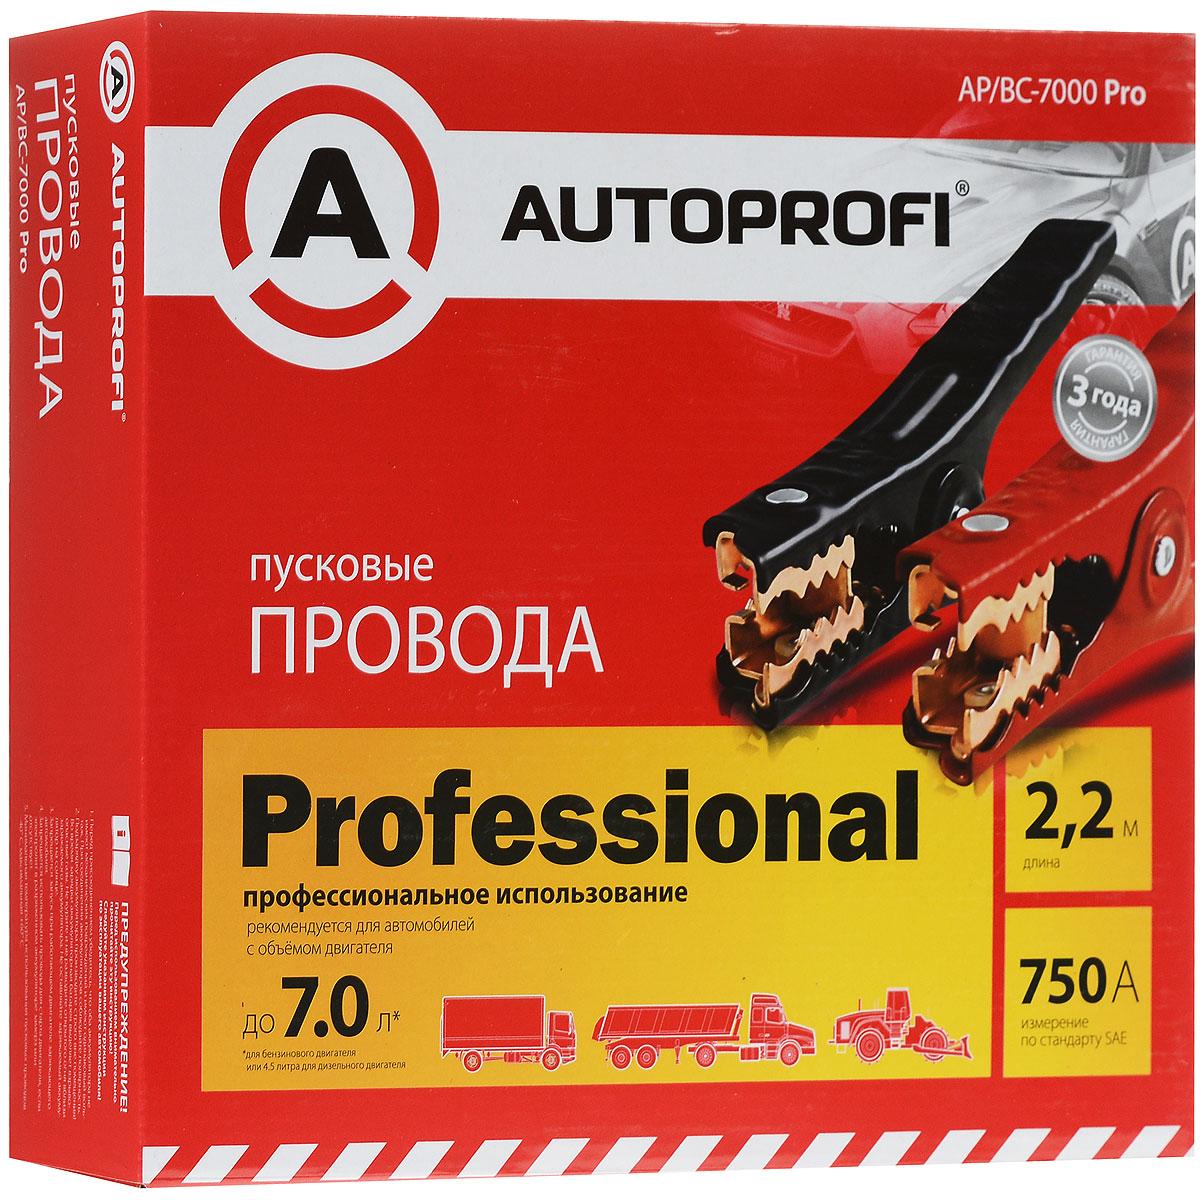 Провода пусковые Autoprofi Professional, 43 мм2, 750 A, 2,2 м провода пусковые autoprofi 4 65 мм 125a sae 2 2 м